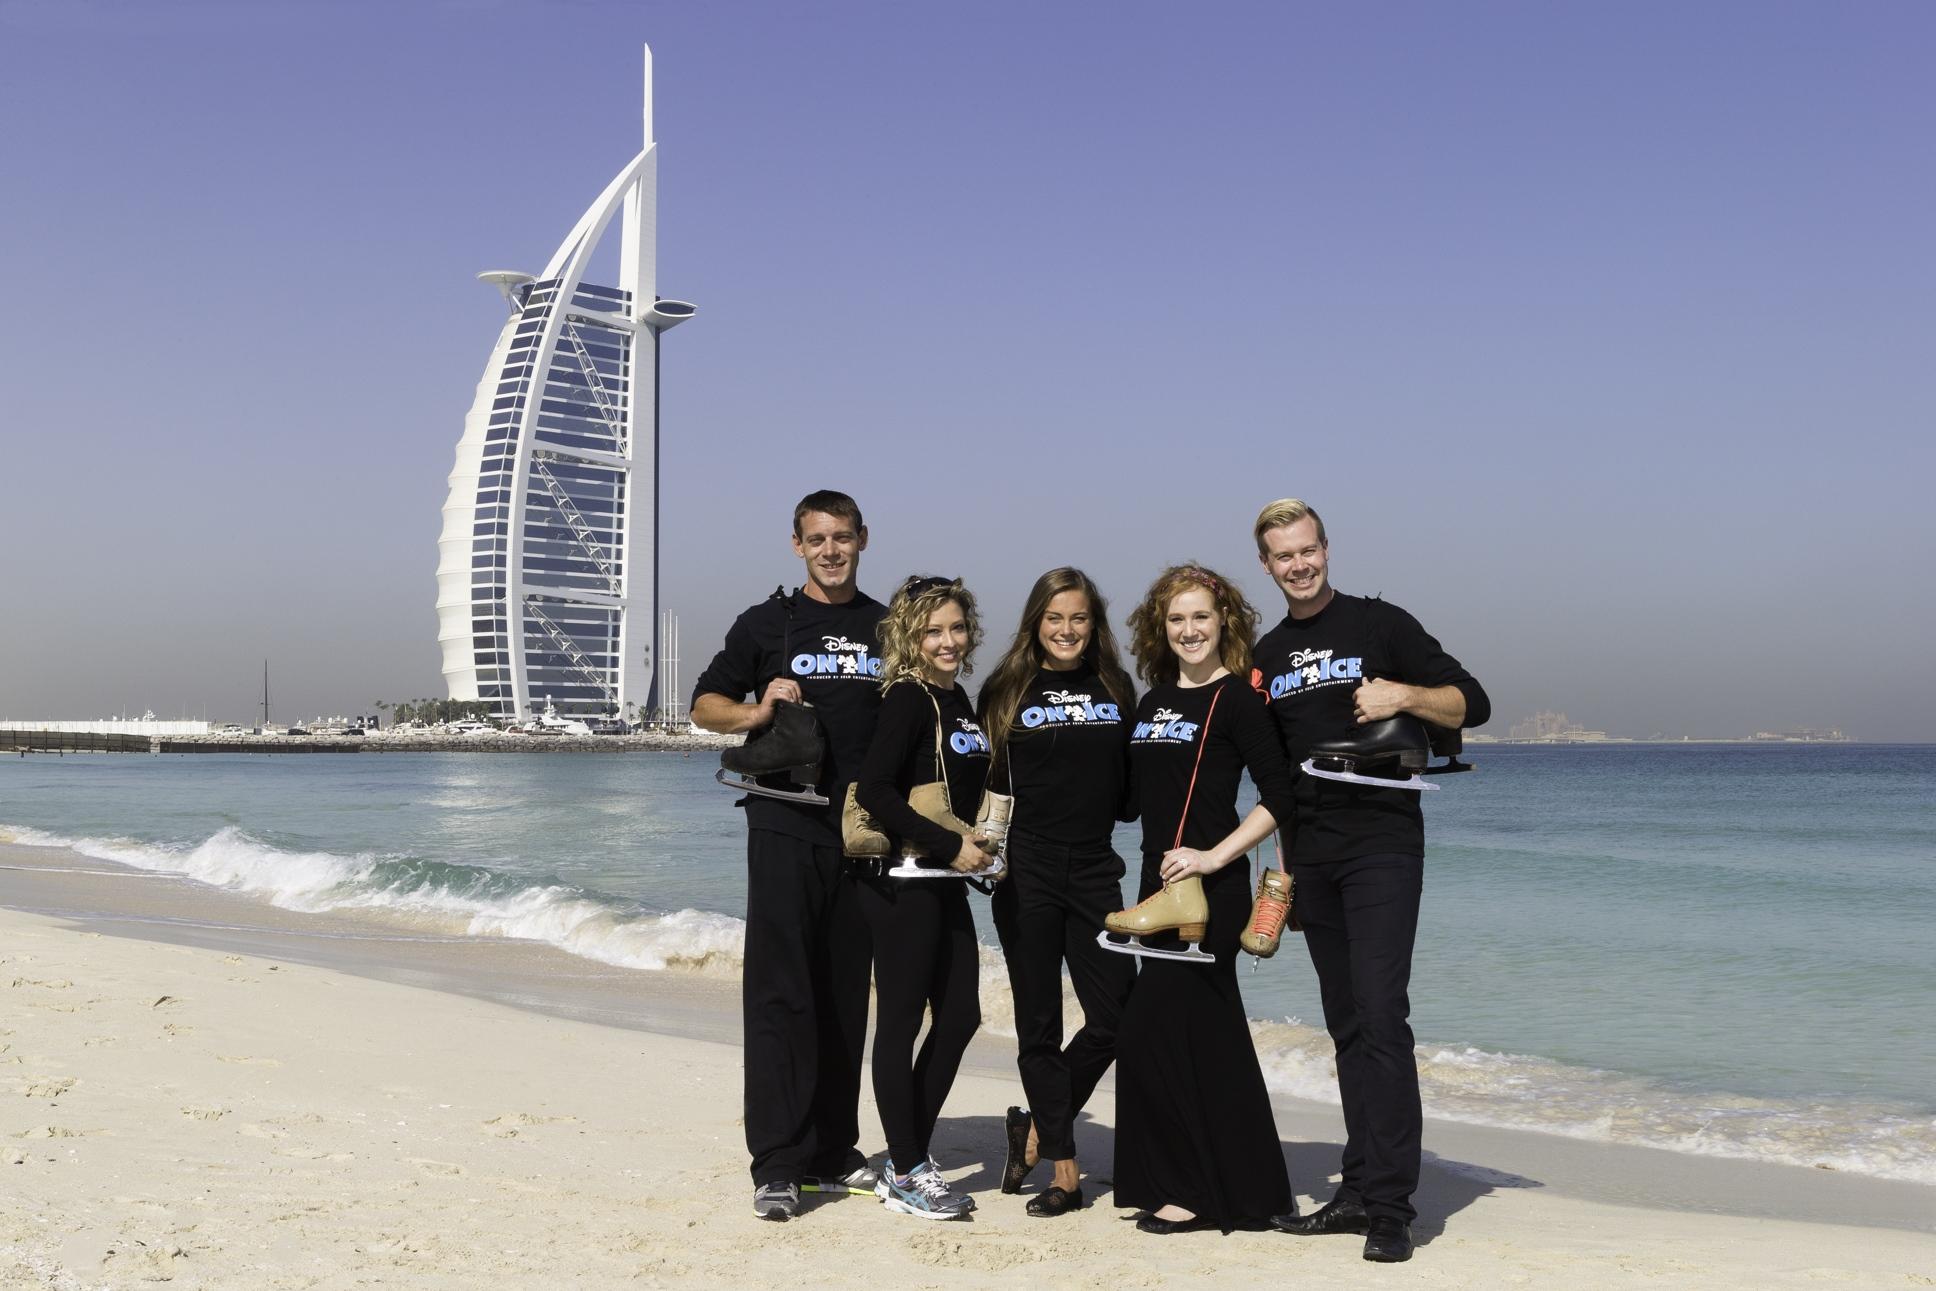 Disney on Ice lands in Dubai - Digital Studio Middle East